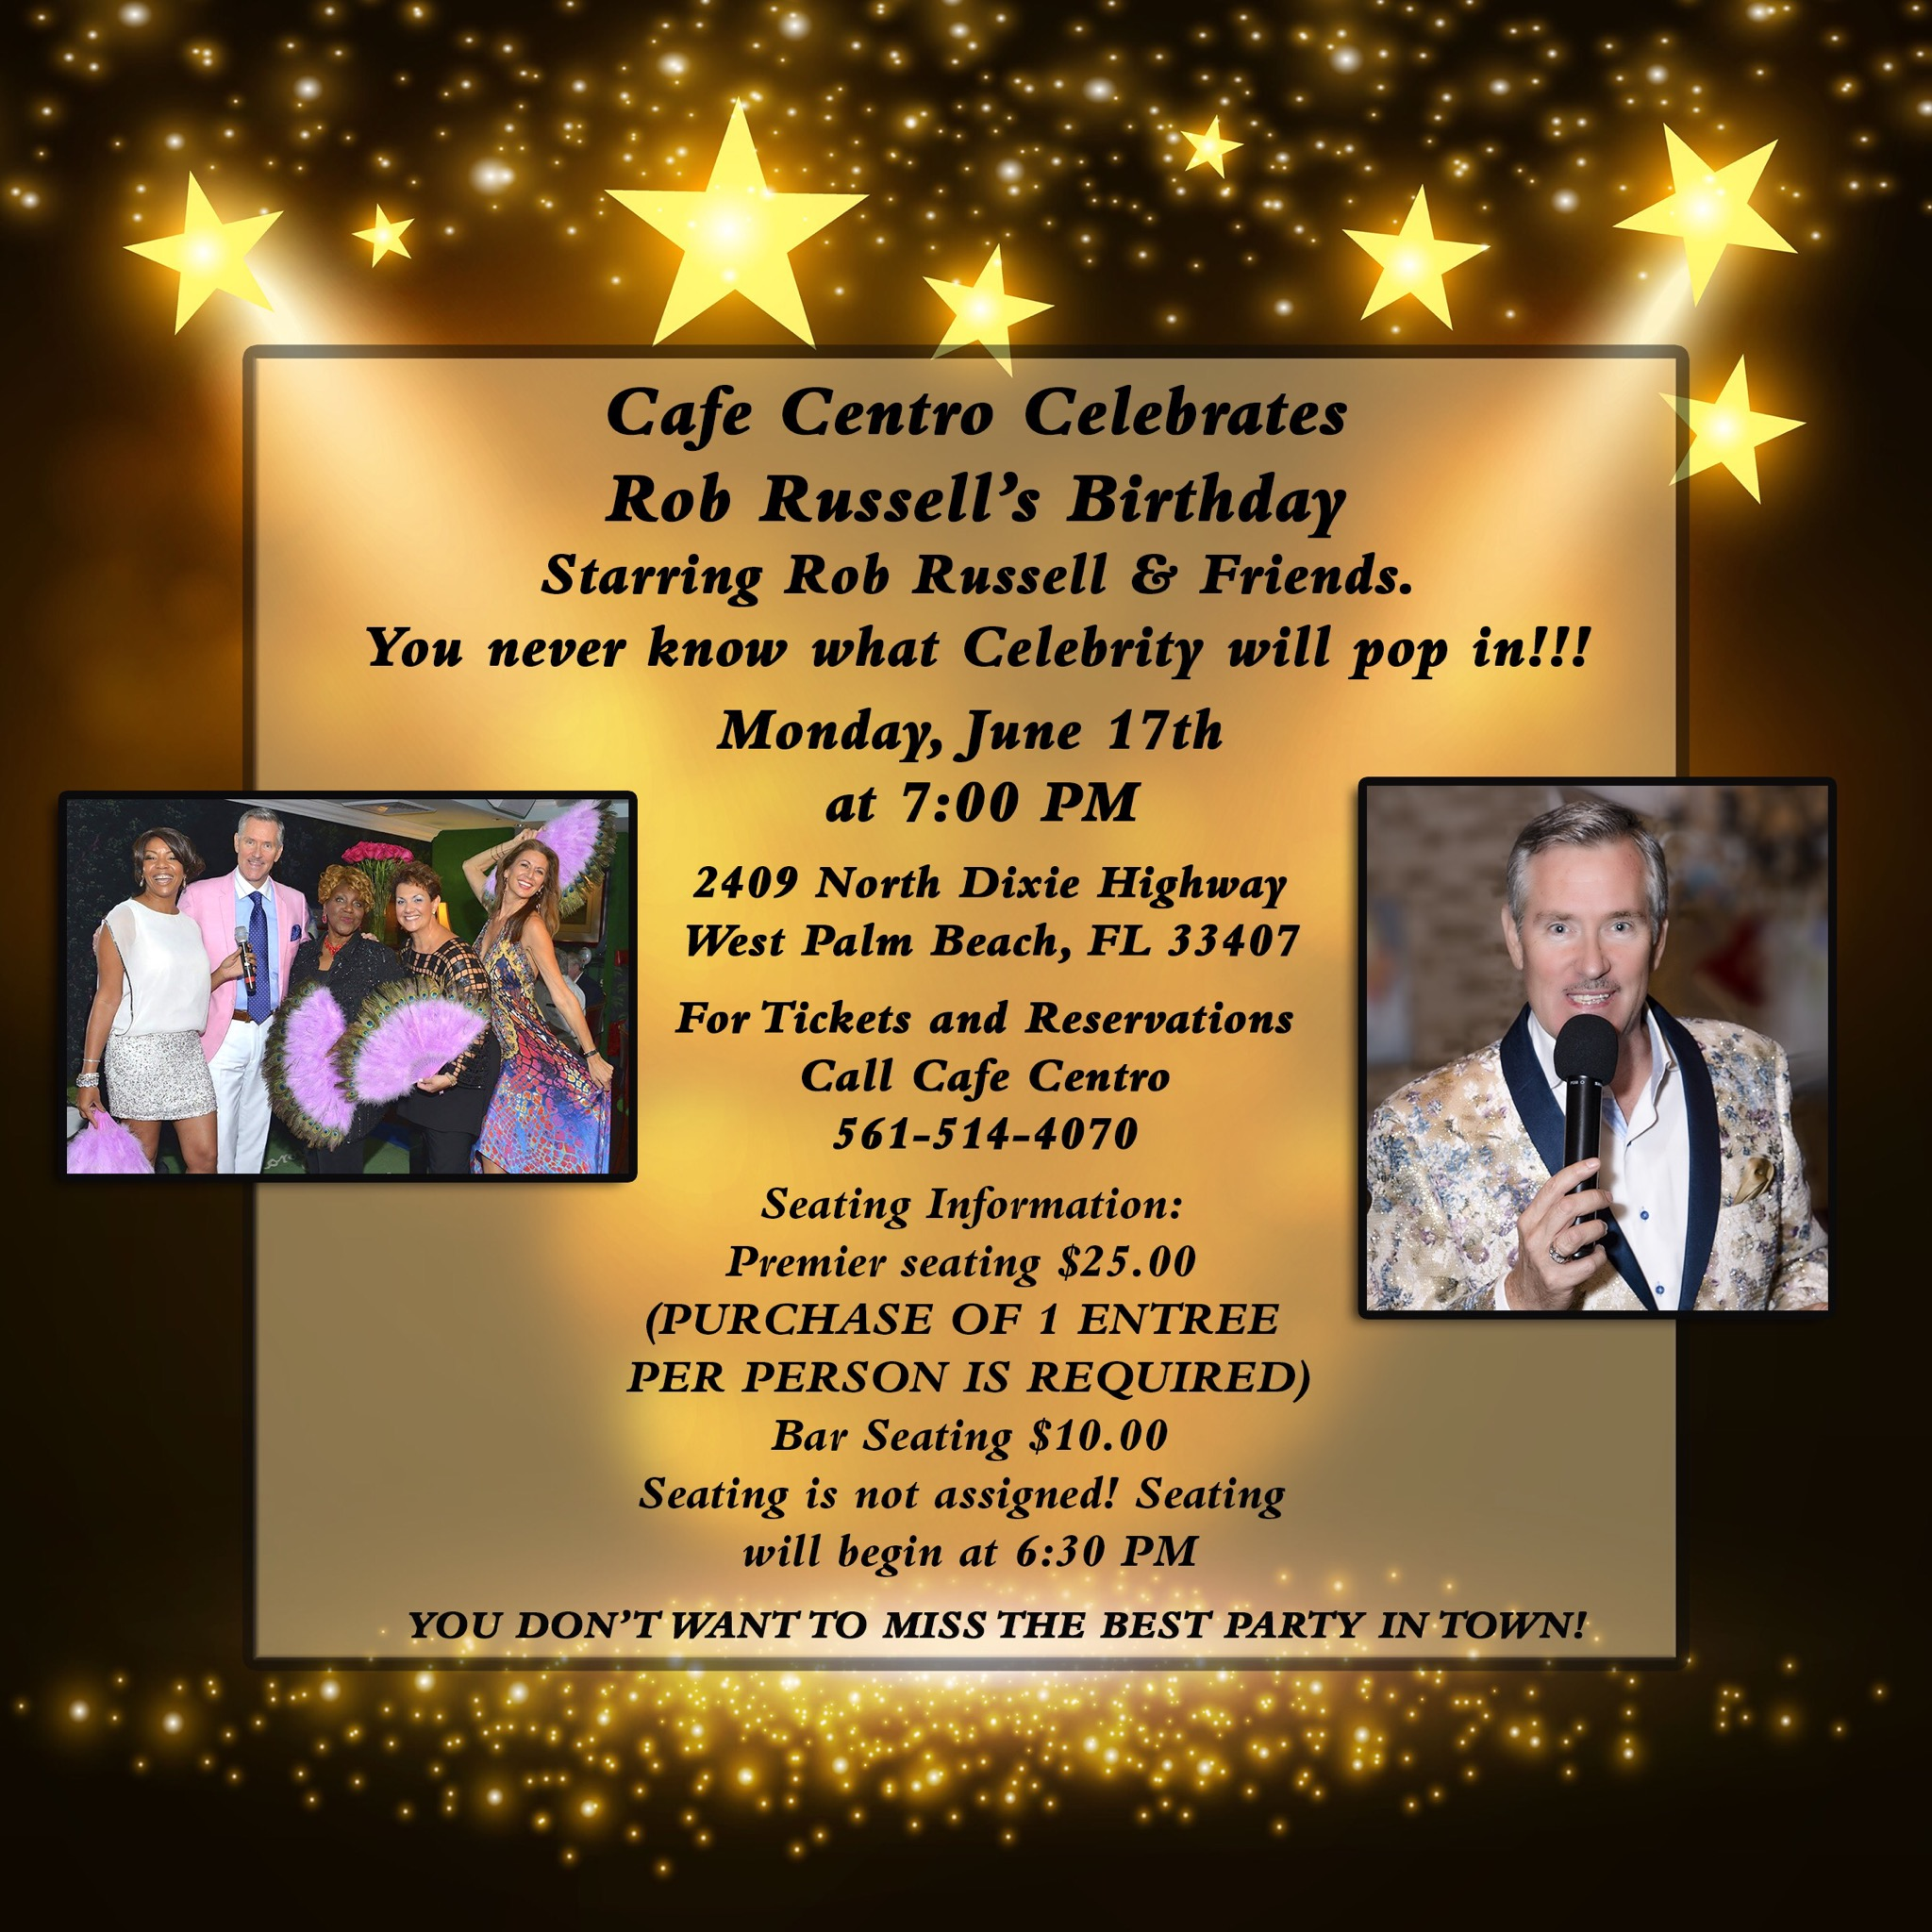 CAFE CENTRO Celebrates The Birthday Of Singer/Showman ROB